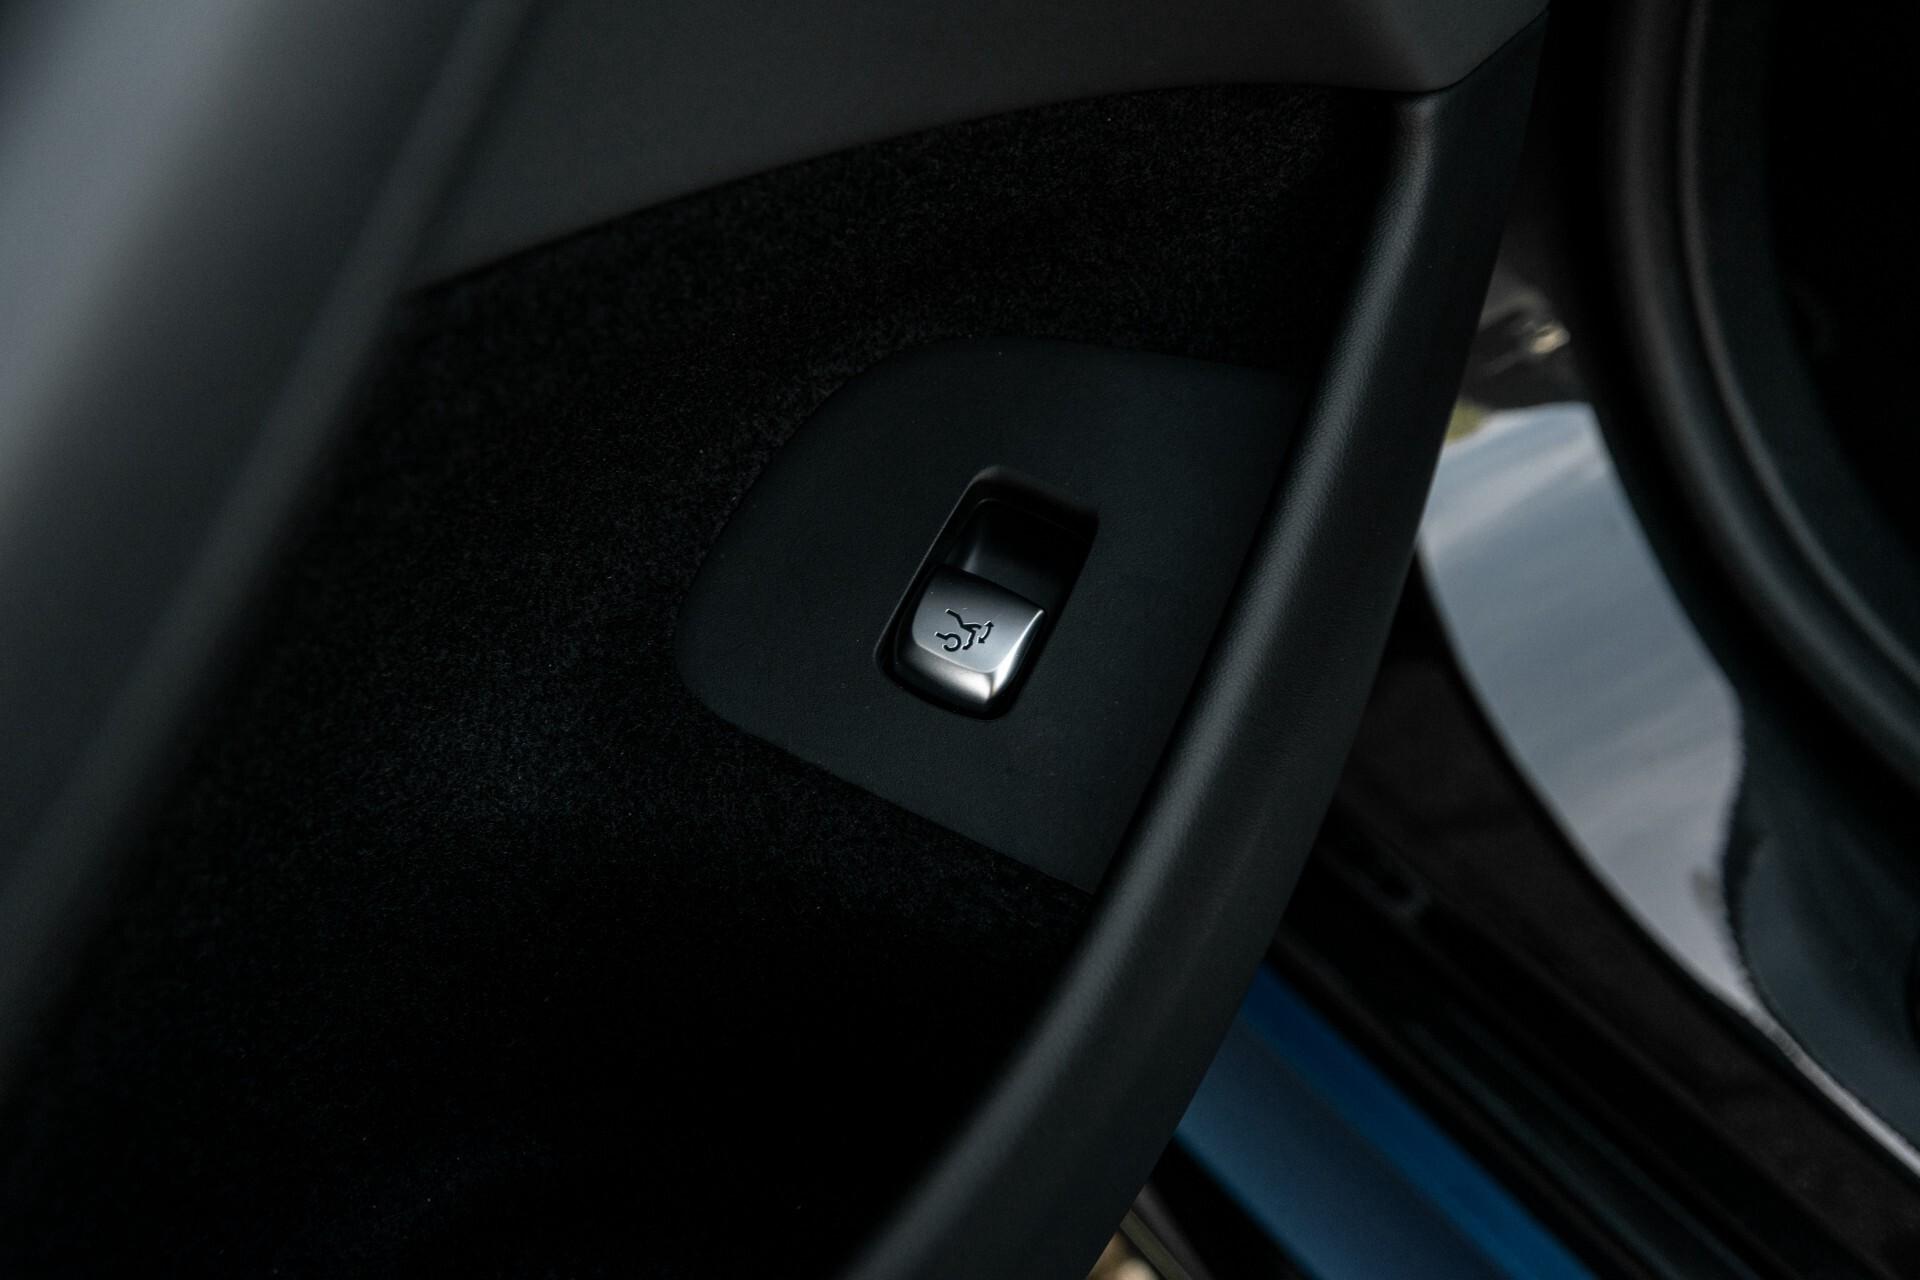 Mercedes-Benz AMG GT 4-Door Coupe 63 S 4MATIC+ Edition 1 Keramisch/Carbon/First Class/Dynamic Plus/Burmester High End 3D Aut9 Foto 28